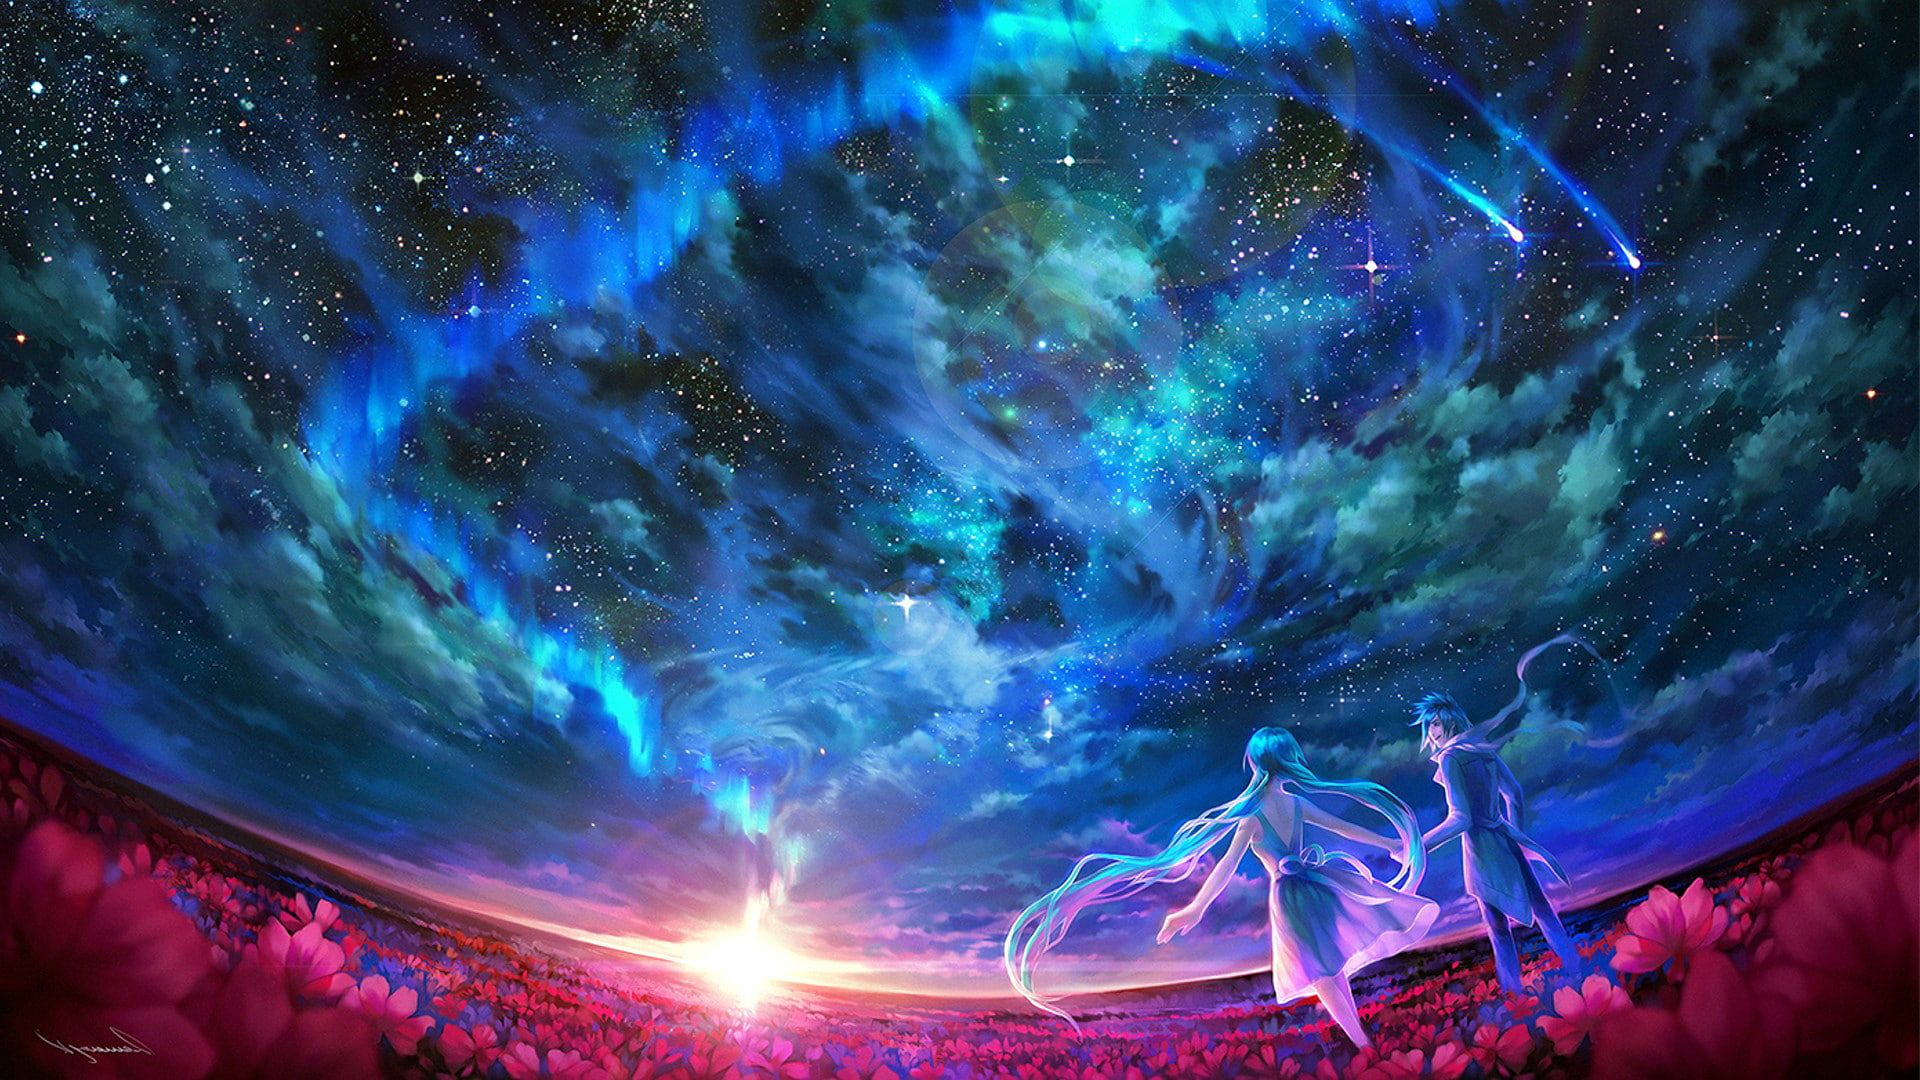 Pin By Liudmyla Grishchenko On X Sky Art Blue Anime Anime Galaxy